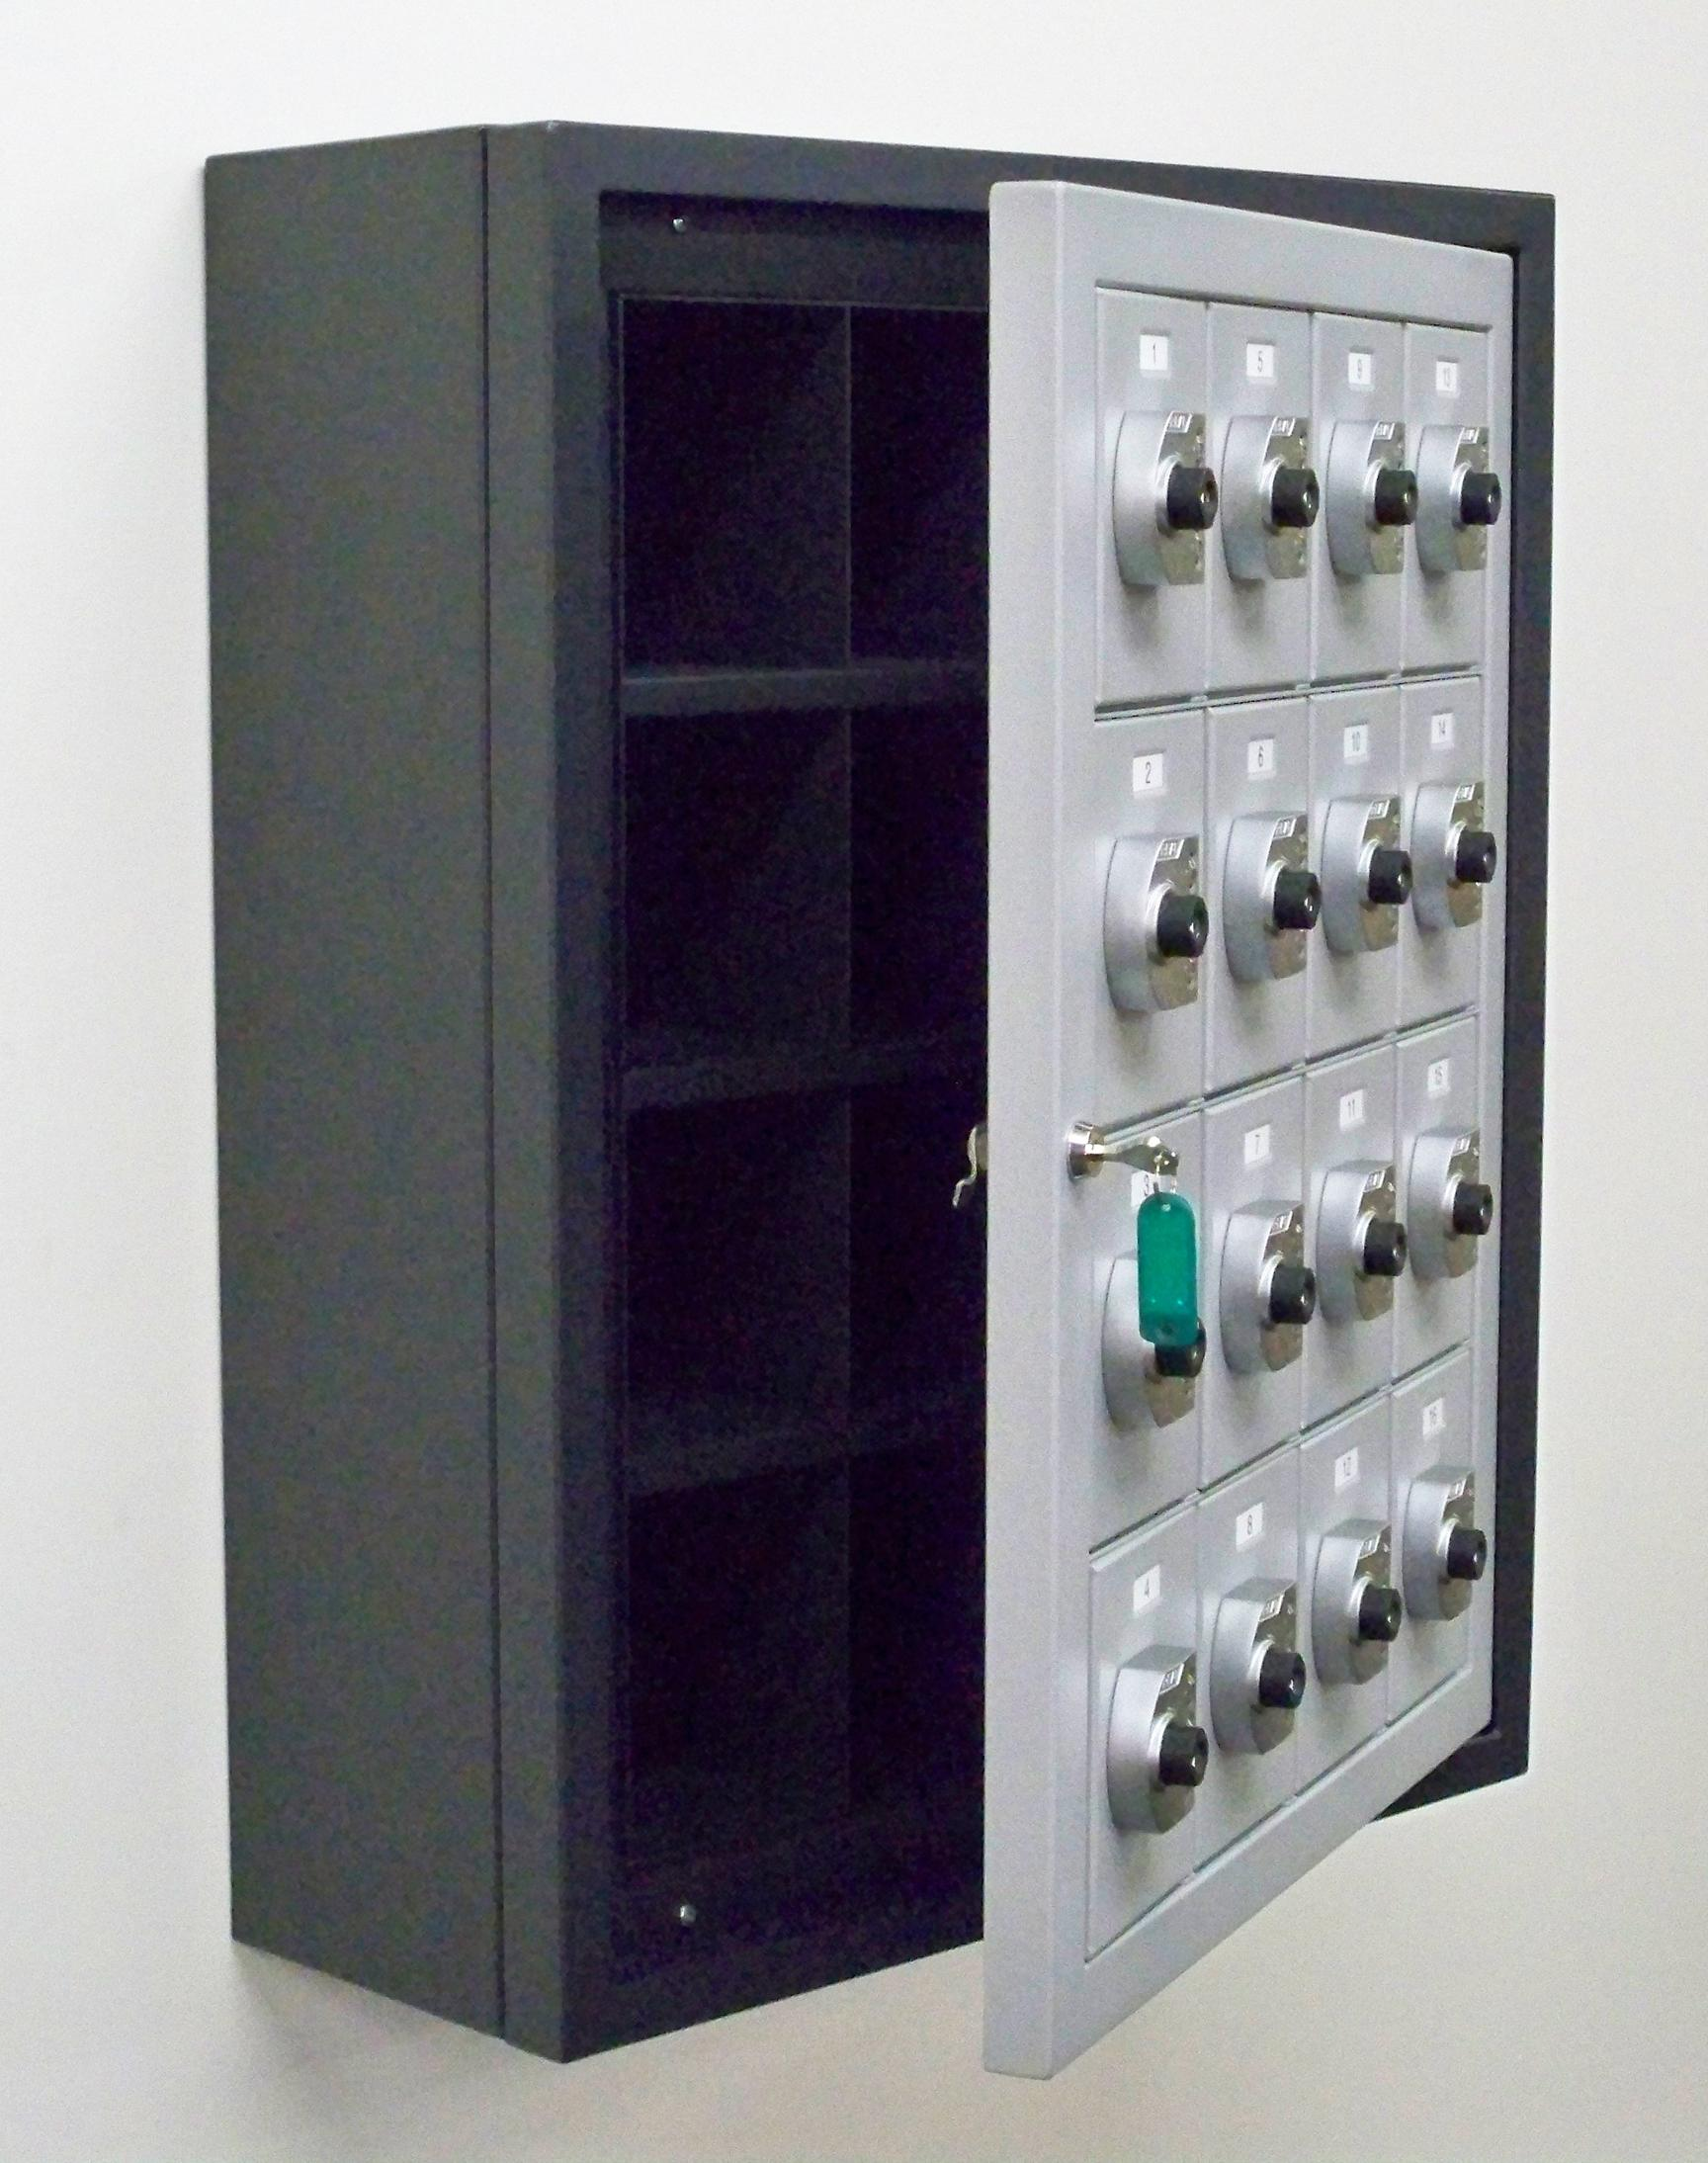 Precision Lockers Gsa Lockers Cell Phone Lockers On Gsa